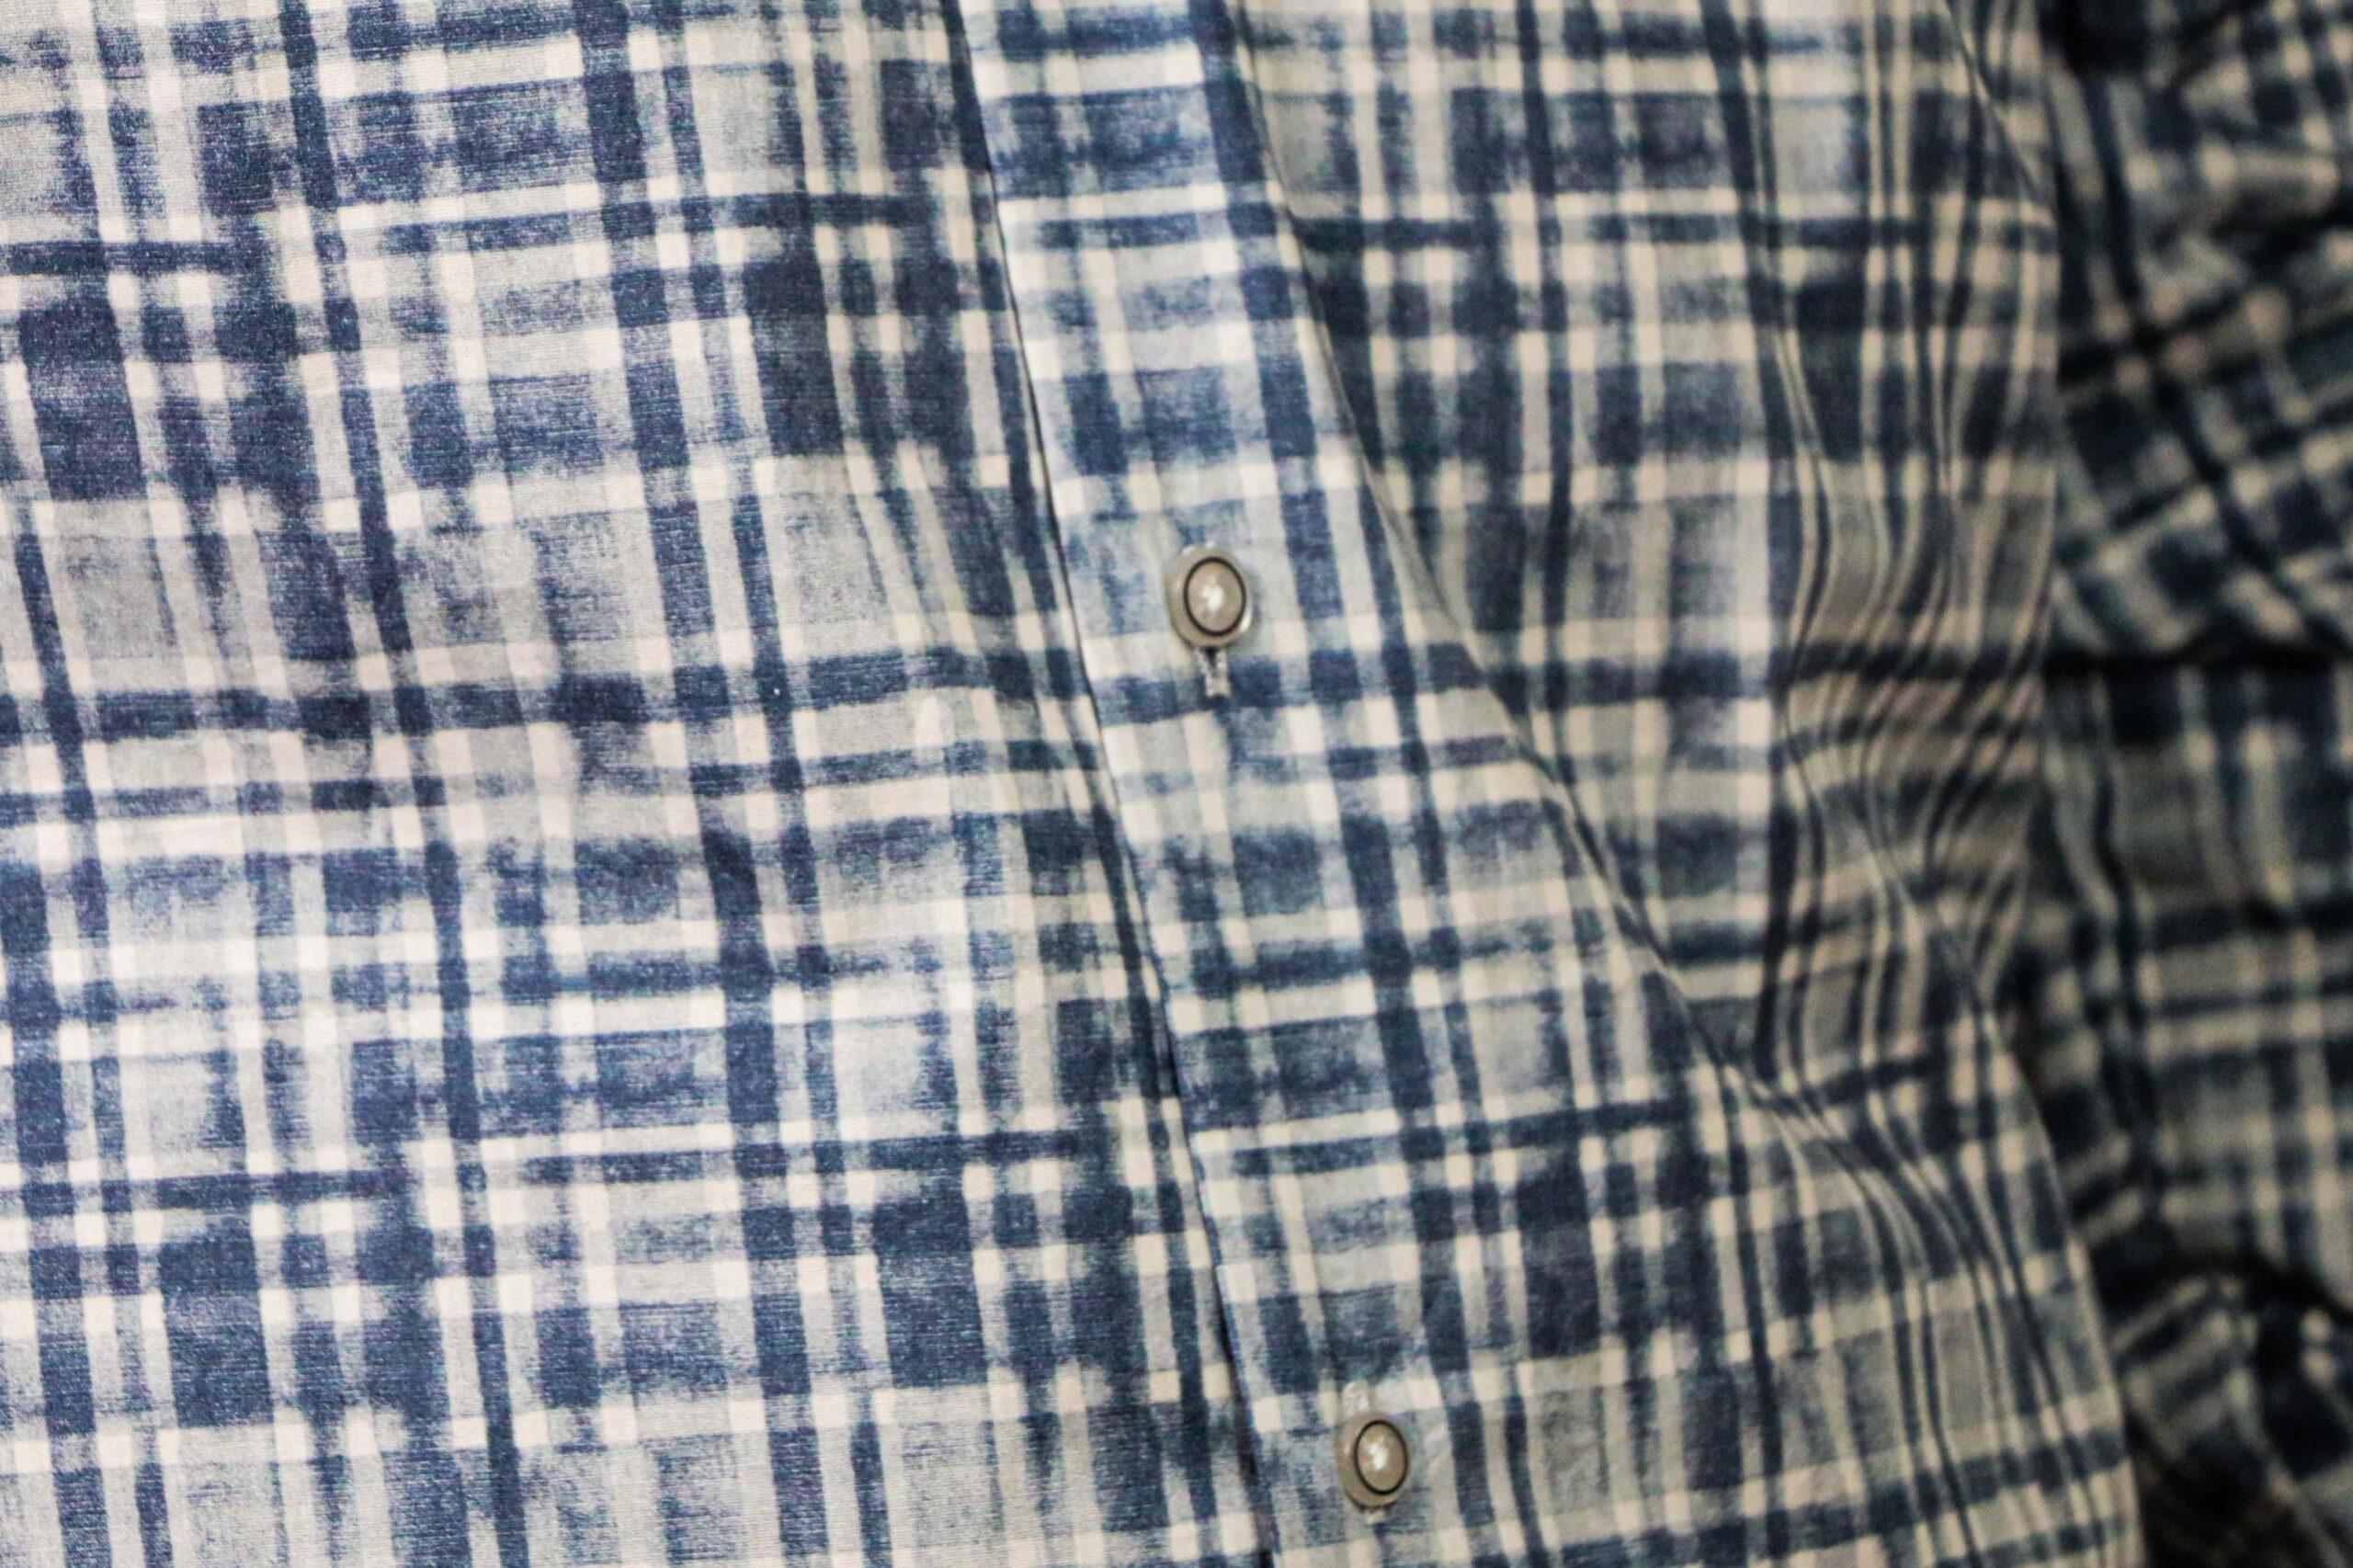 wholesale-shirt-supply-211